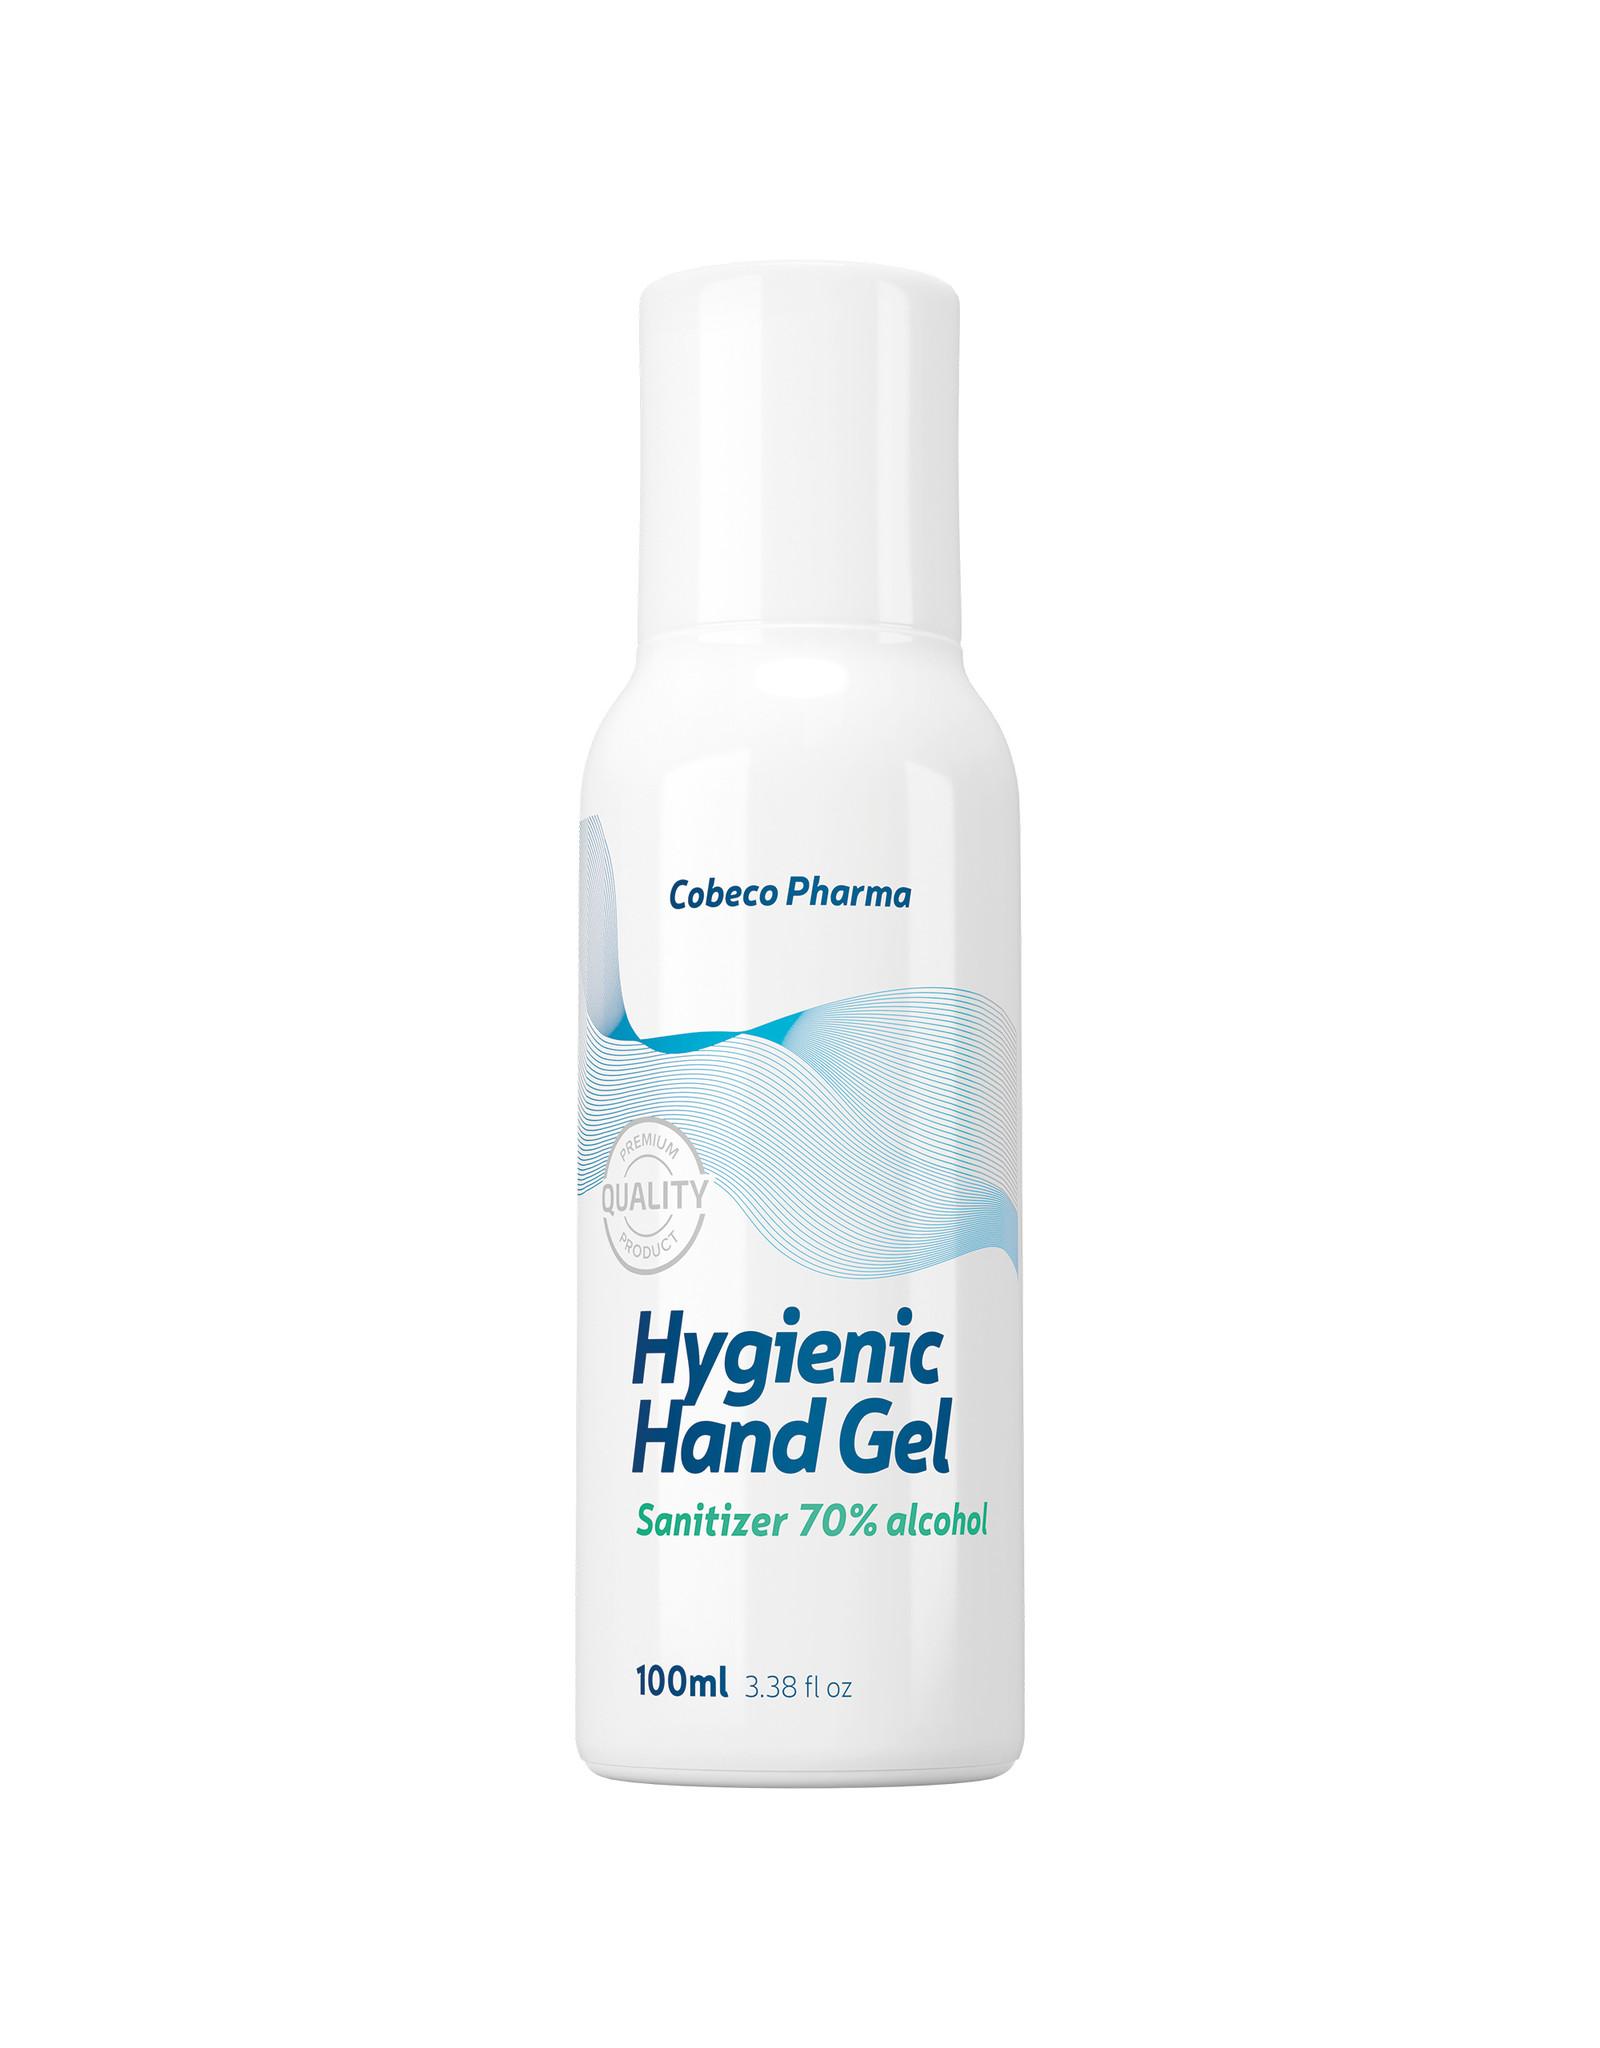 Cobeco Pharma Cobeco Hygienic handalcohol gel (Desinfecterende handalcohol) (70%alc.)